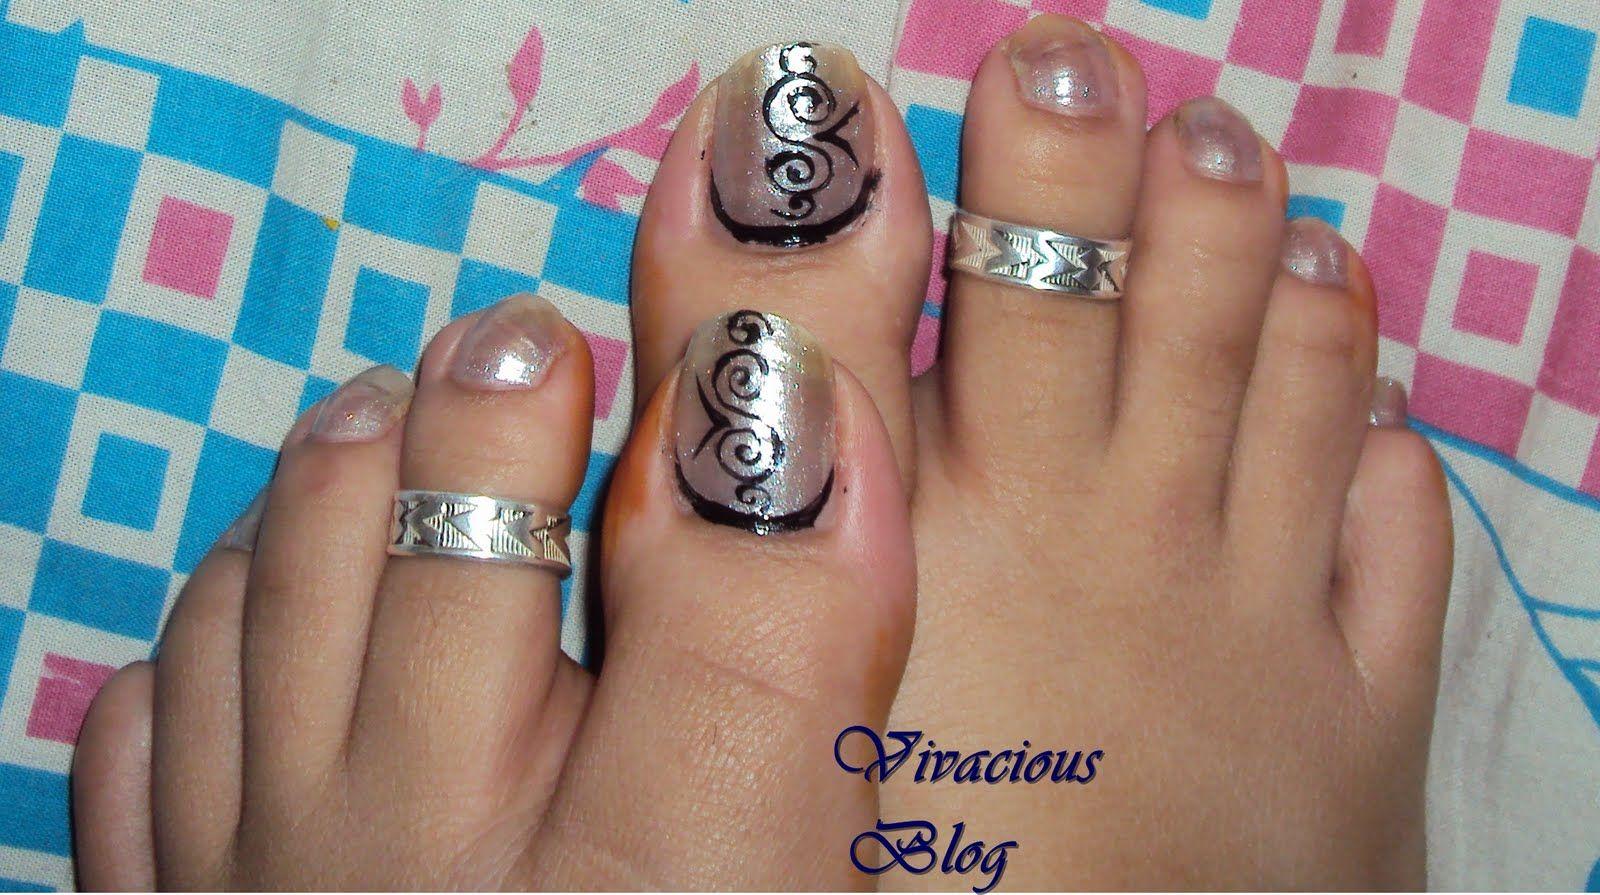 toenail designs | Vivacious Blog: Toe Nail Art | Stuff to Try ...